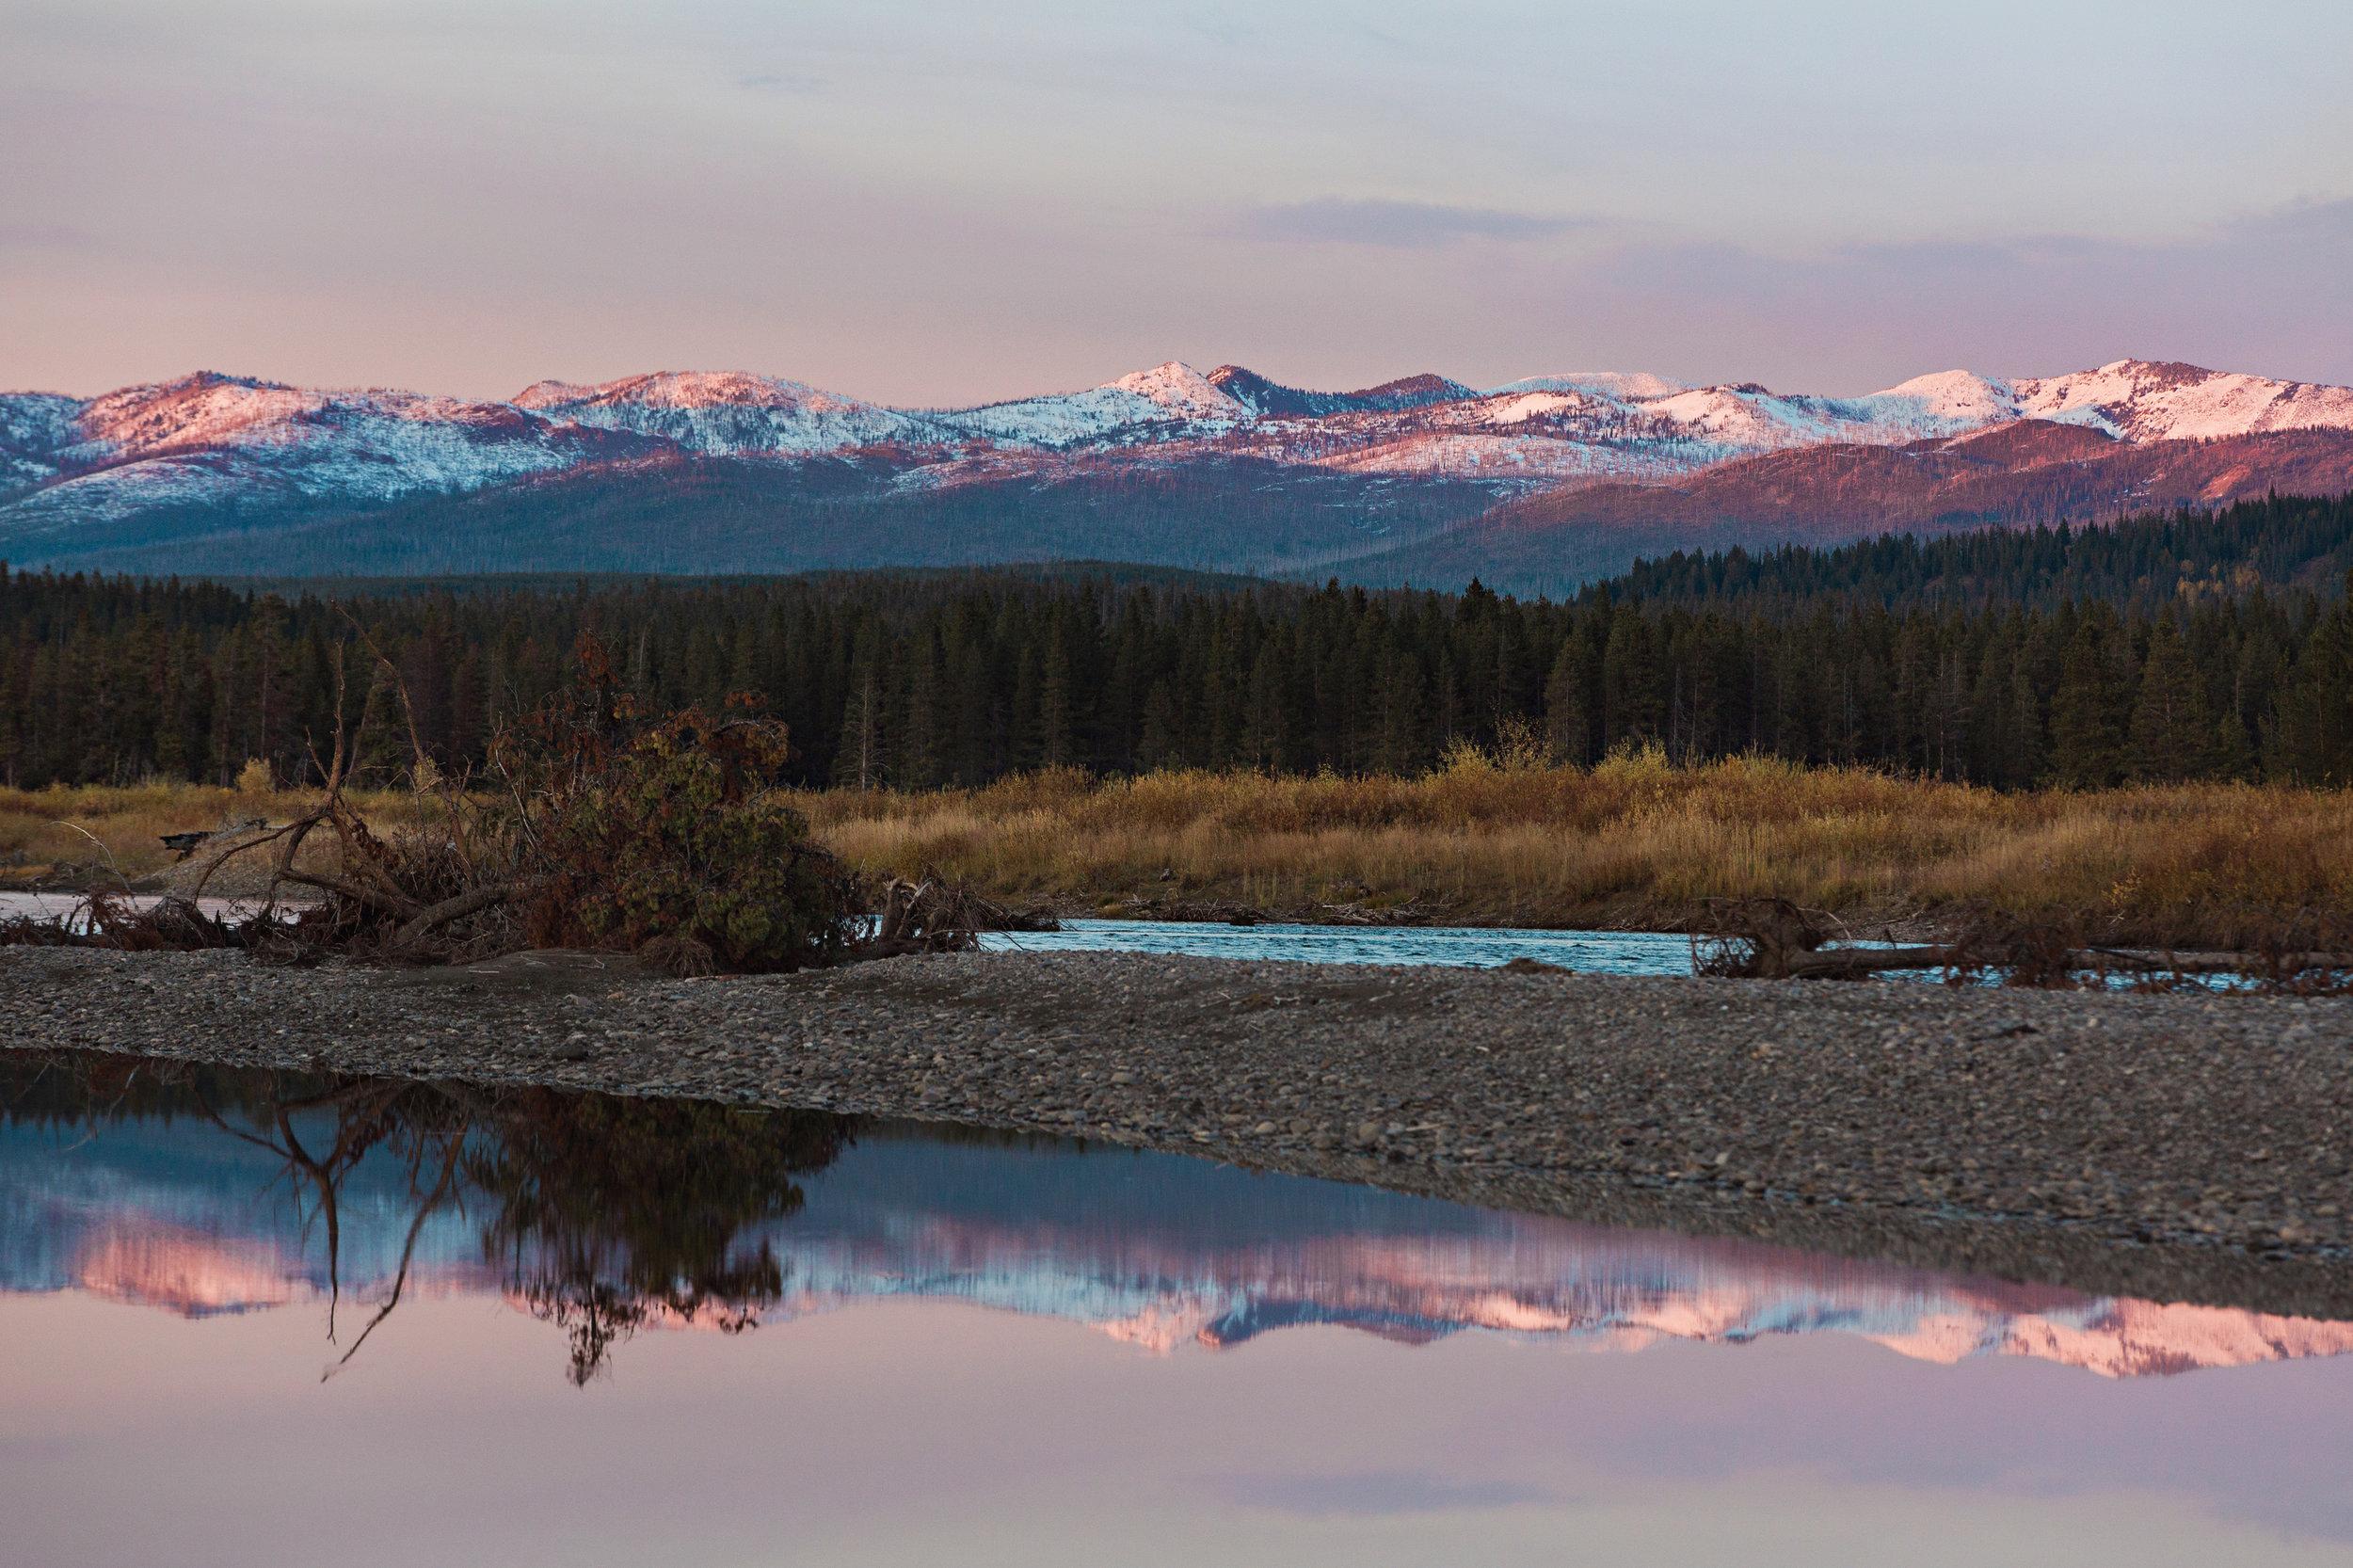 CindyGiovagnoli_Yellowstone_Grand_Teton_National_Park_Wyoming_mountains_deer_sunset_fall_autumn_October_alpenglow-010.jpg